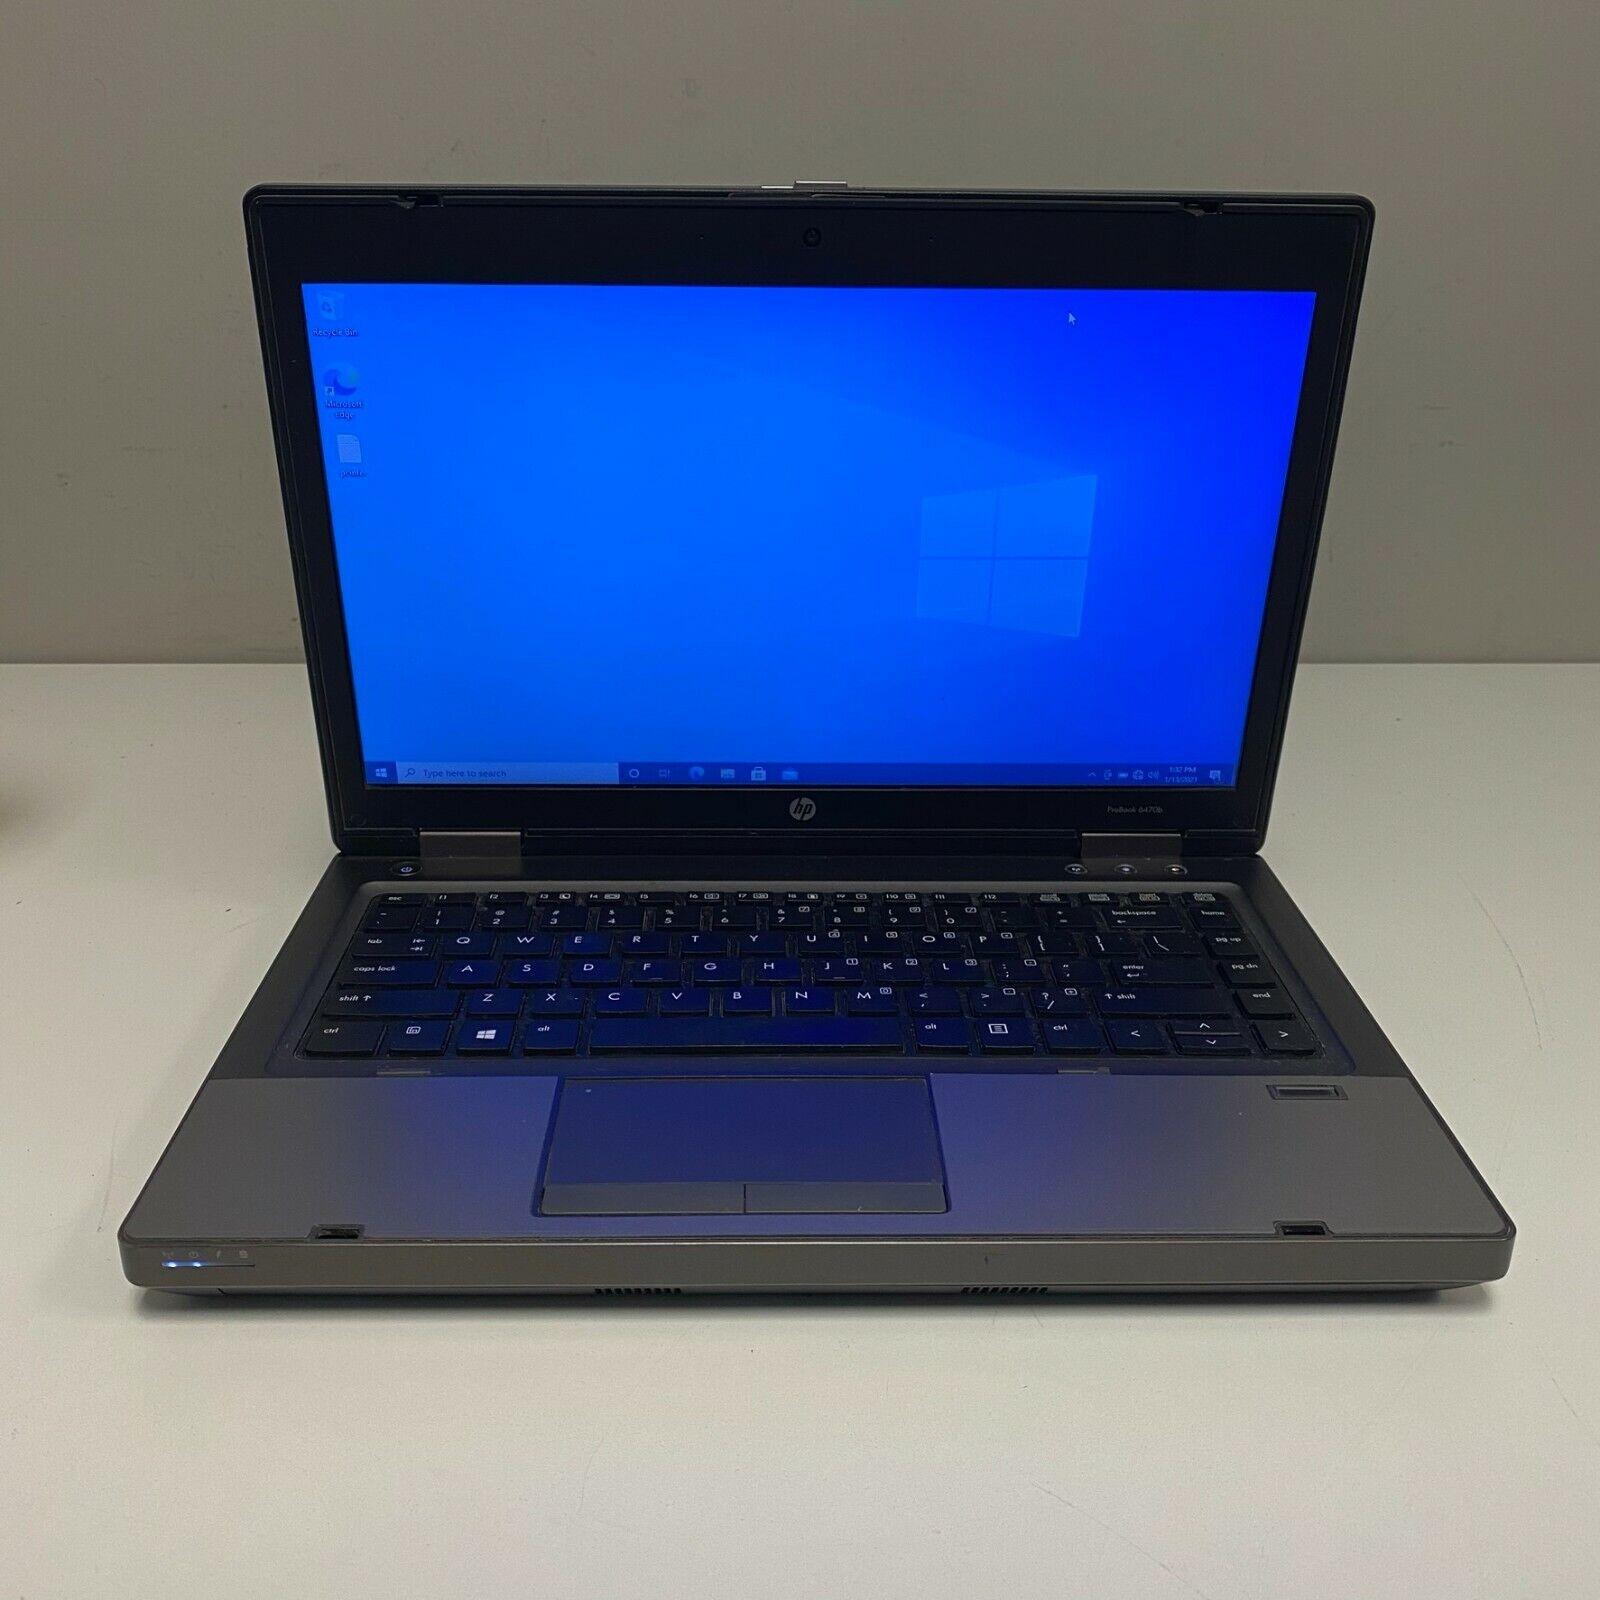 "Laptop Windows - HP ProBook 6470B 14"" Core i5-3320m 2.6GHz 4GB 500GB WiFi WINDOWS 10 PRO LAPTOP"